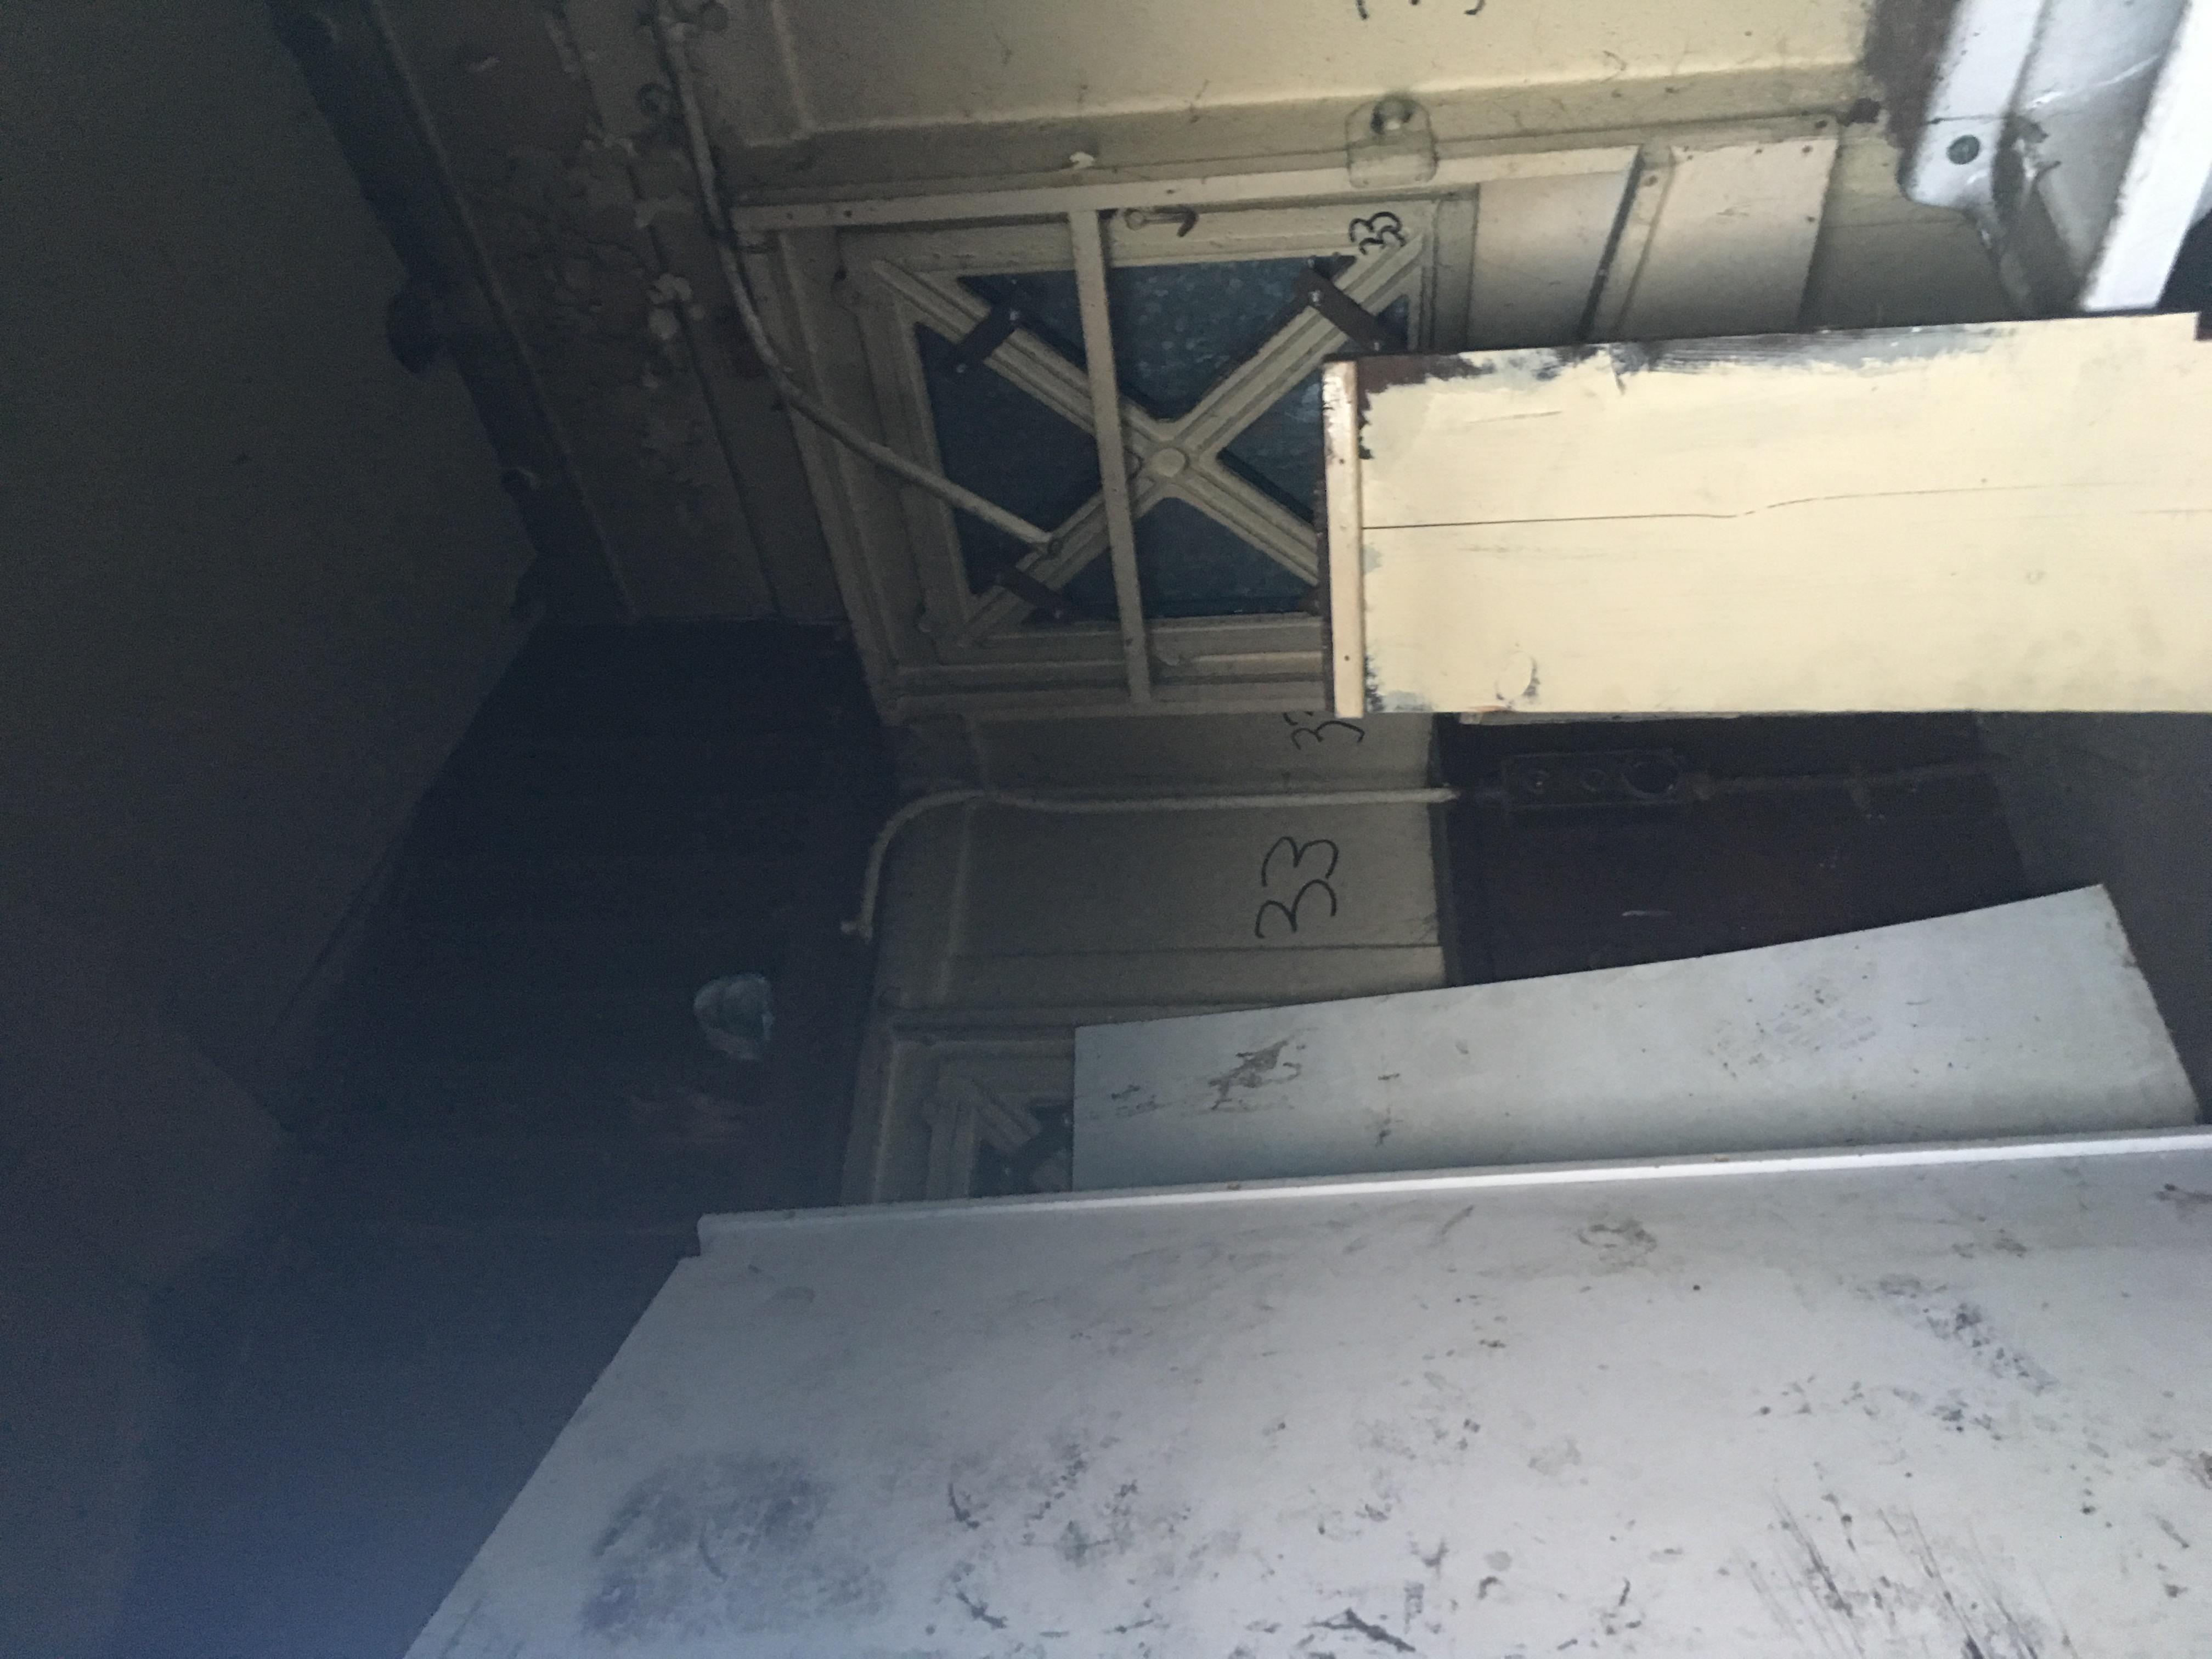 Interior view showing scrap wood